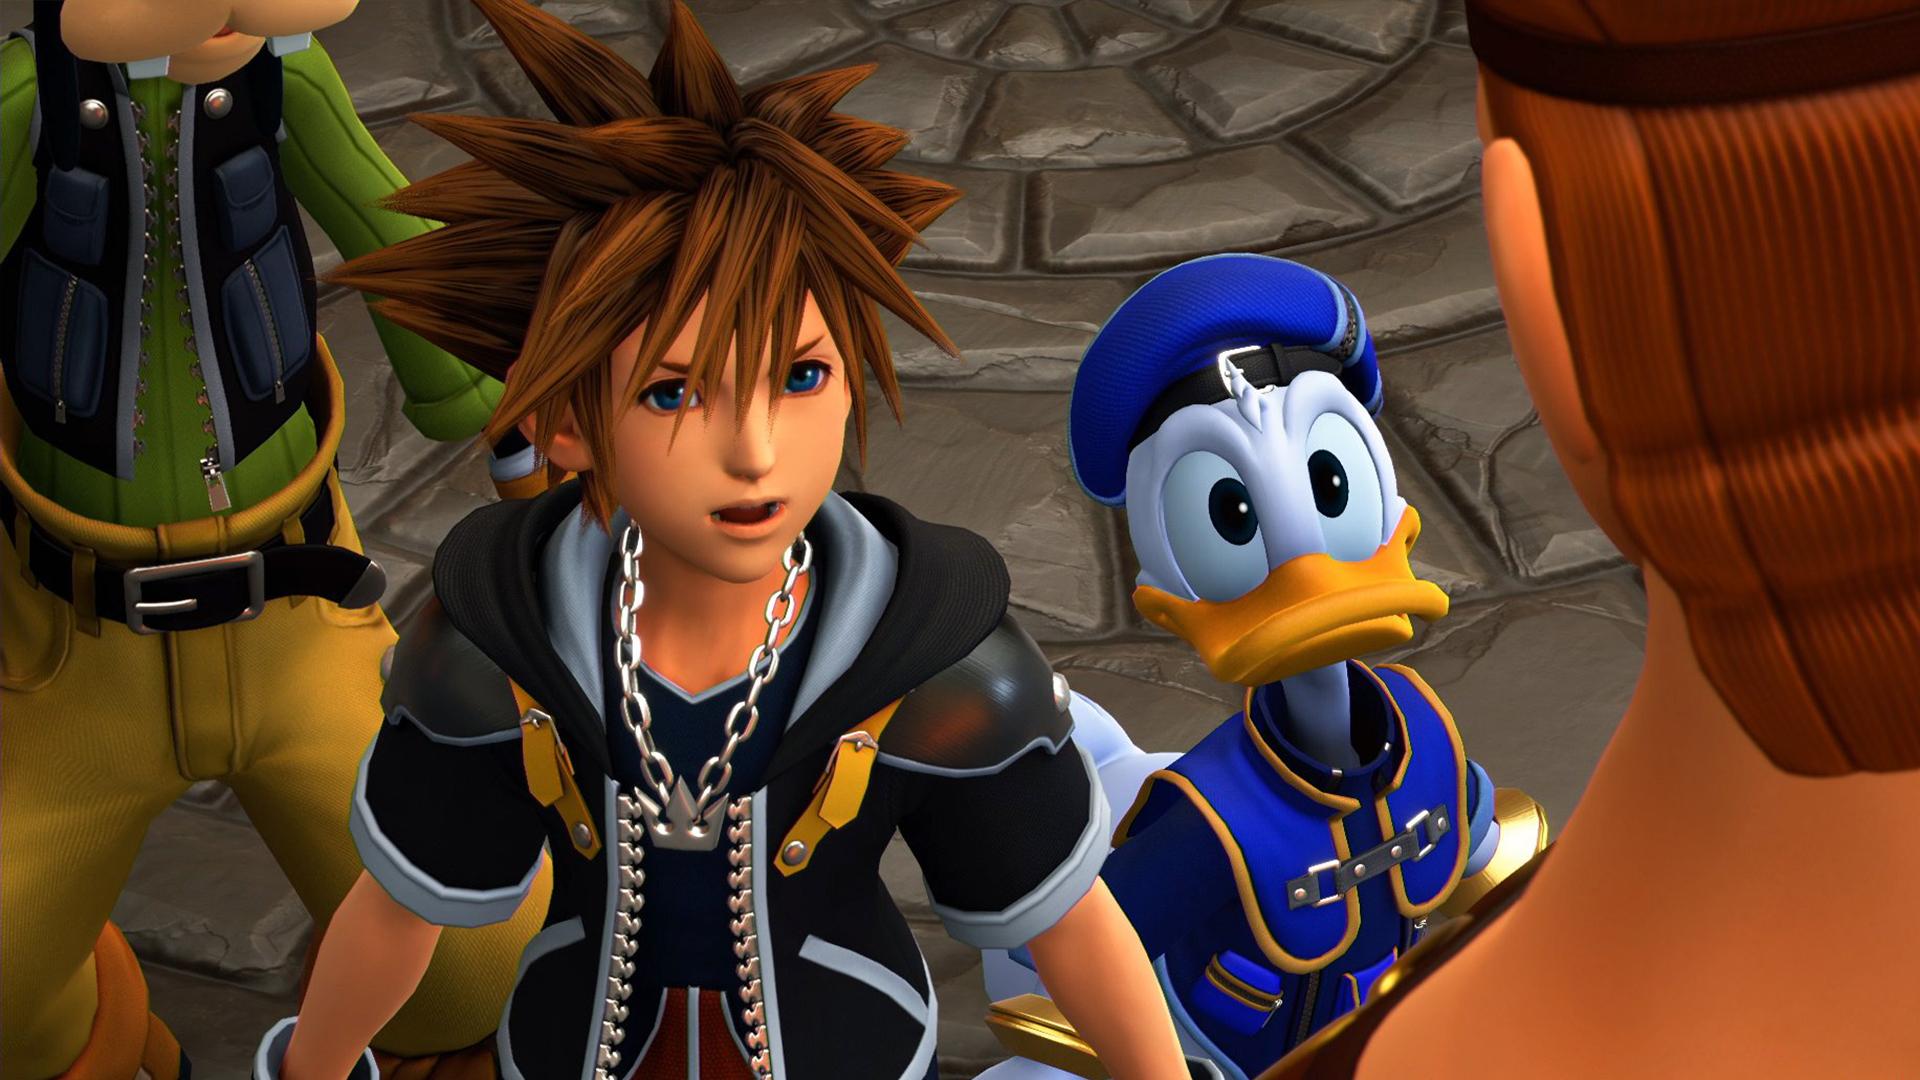 QnA VBage GameStop cancels some Kingdom Hearts PS4 Pro pre-orders